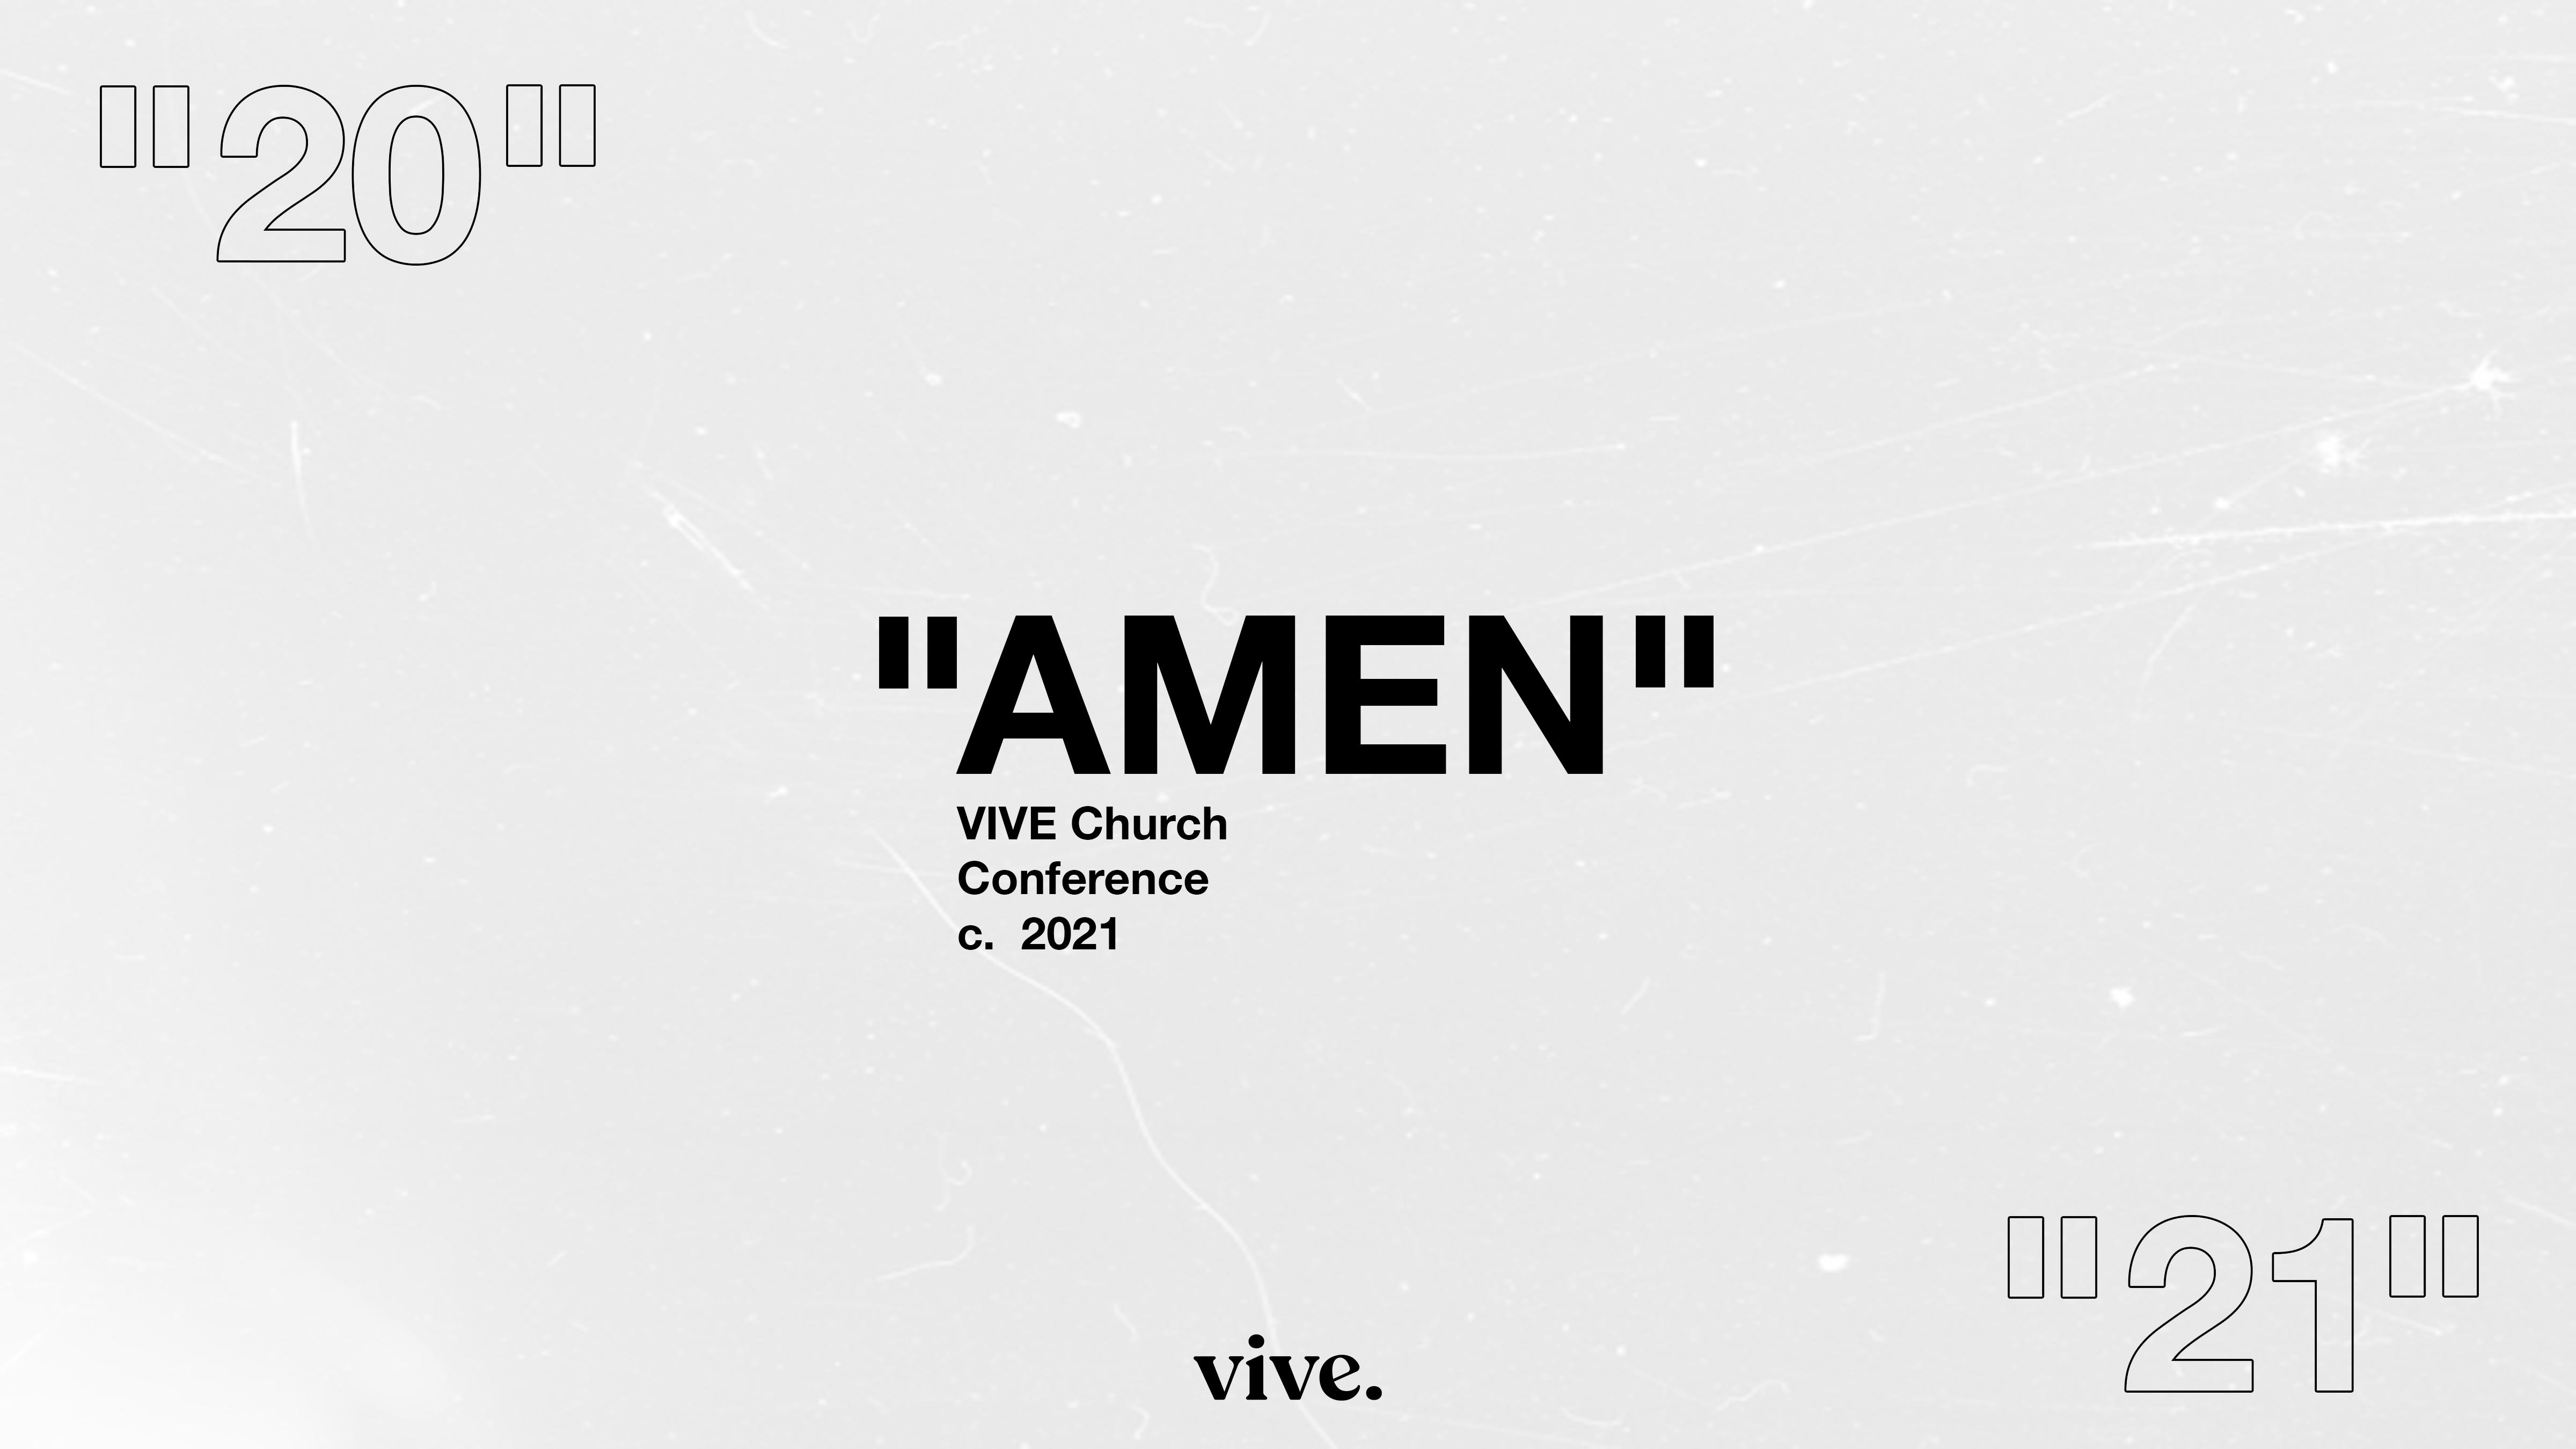 AMEN Conference 2021 by Vive Church Artwork